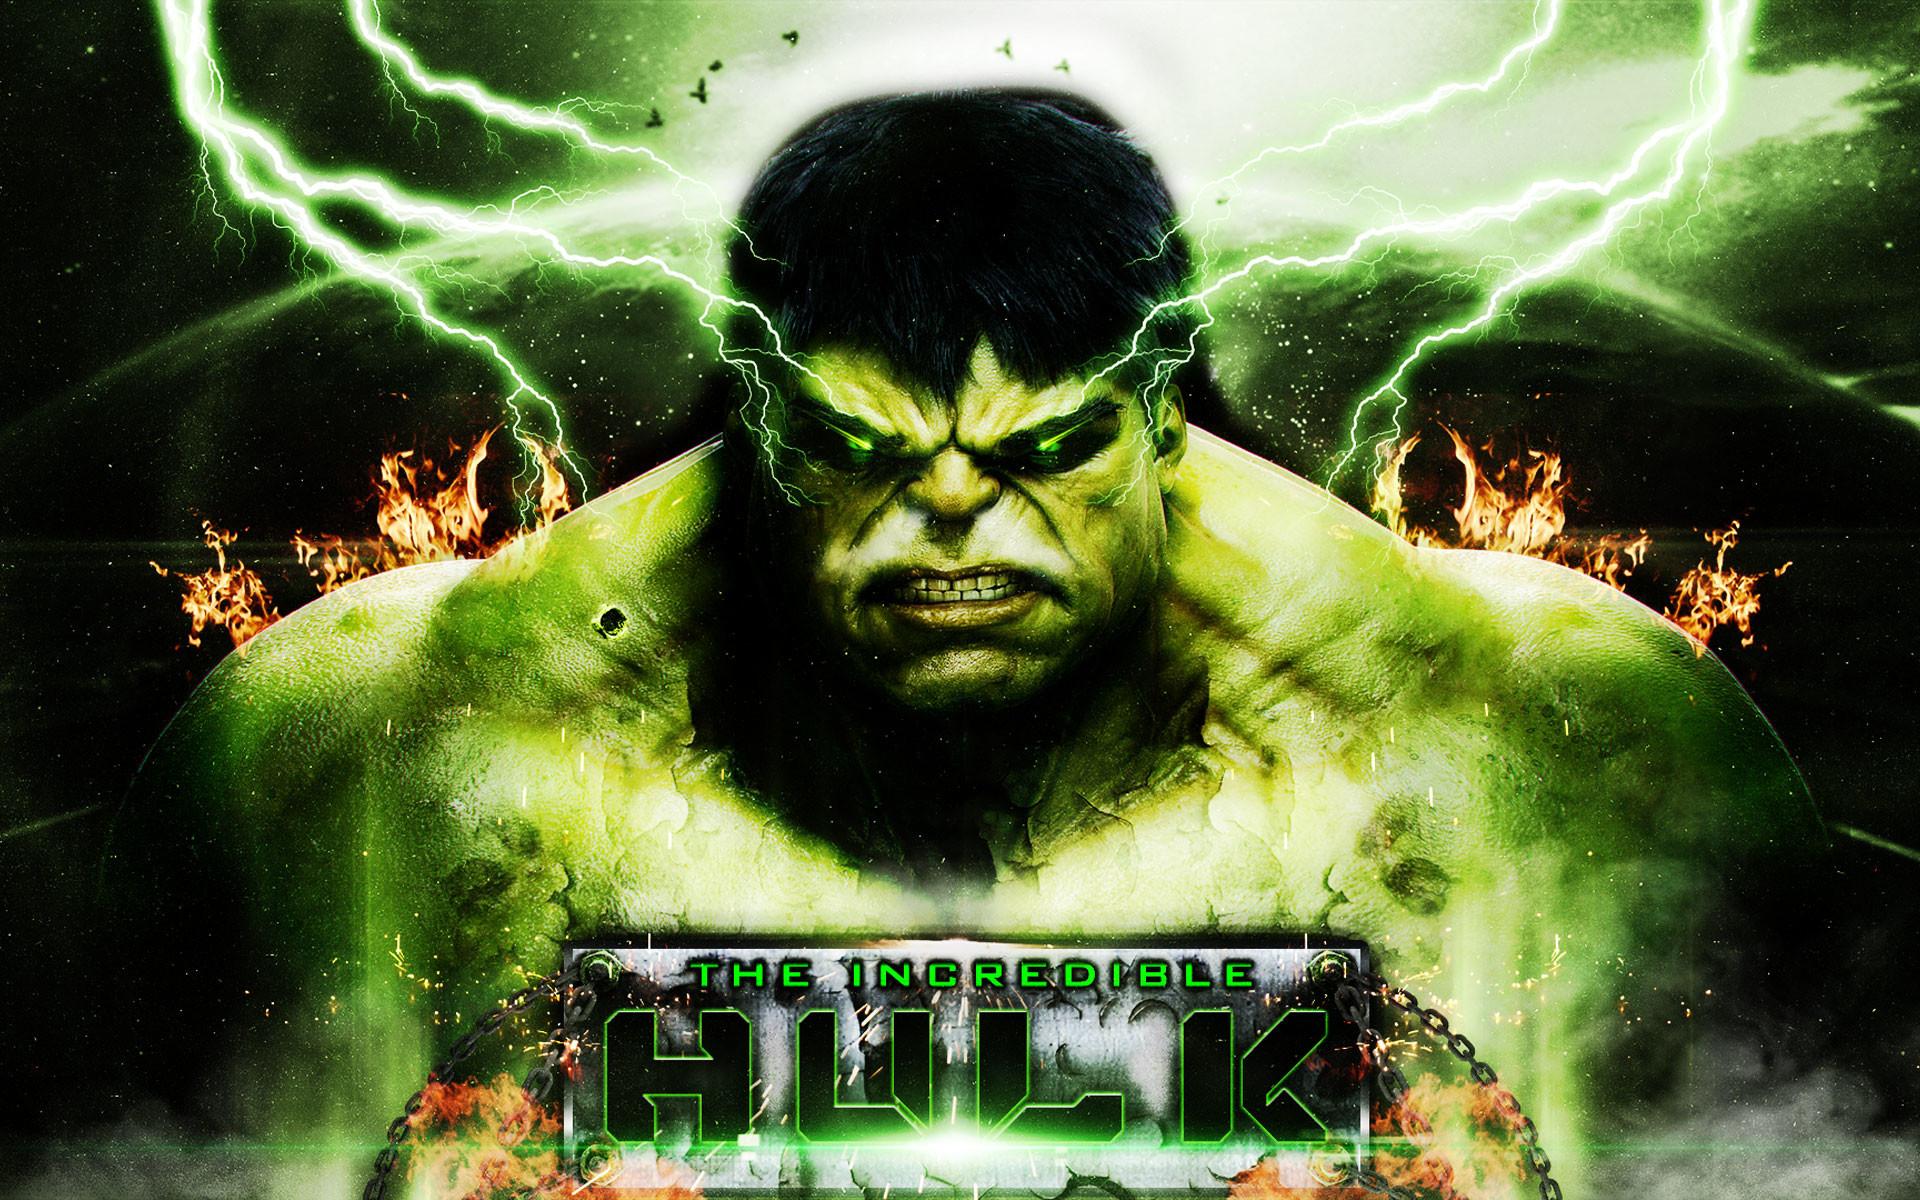 The Hulk Wallpaper | The Incredible Hulk Movie HD Wallpapers